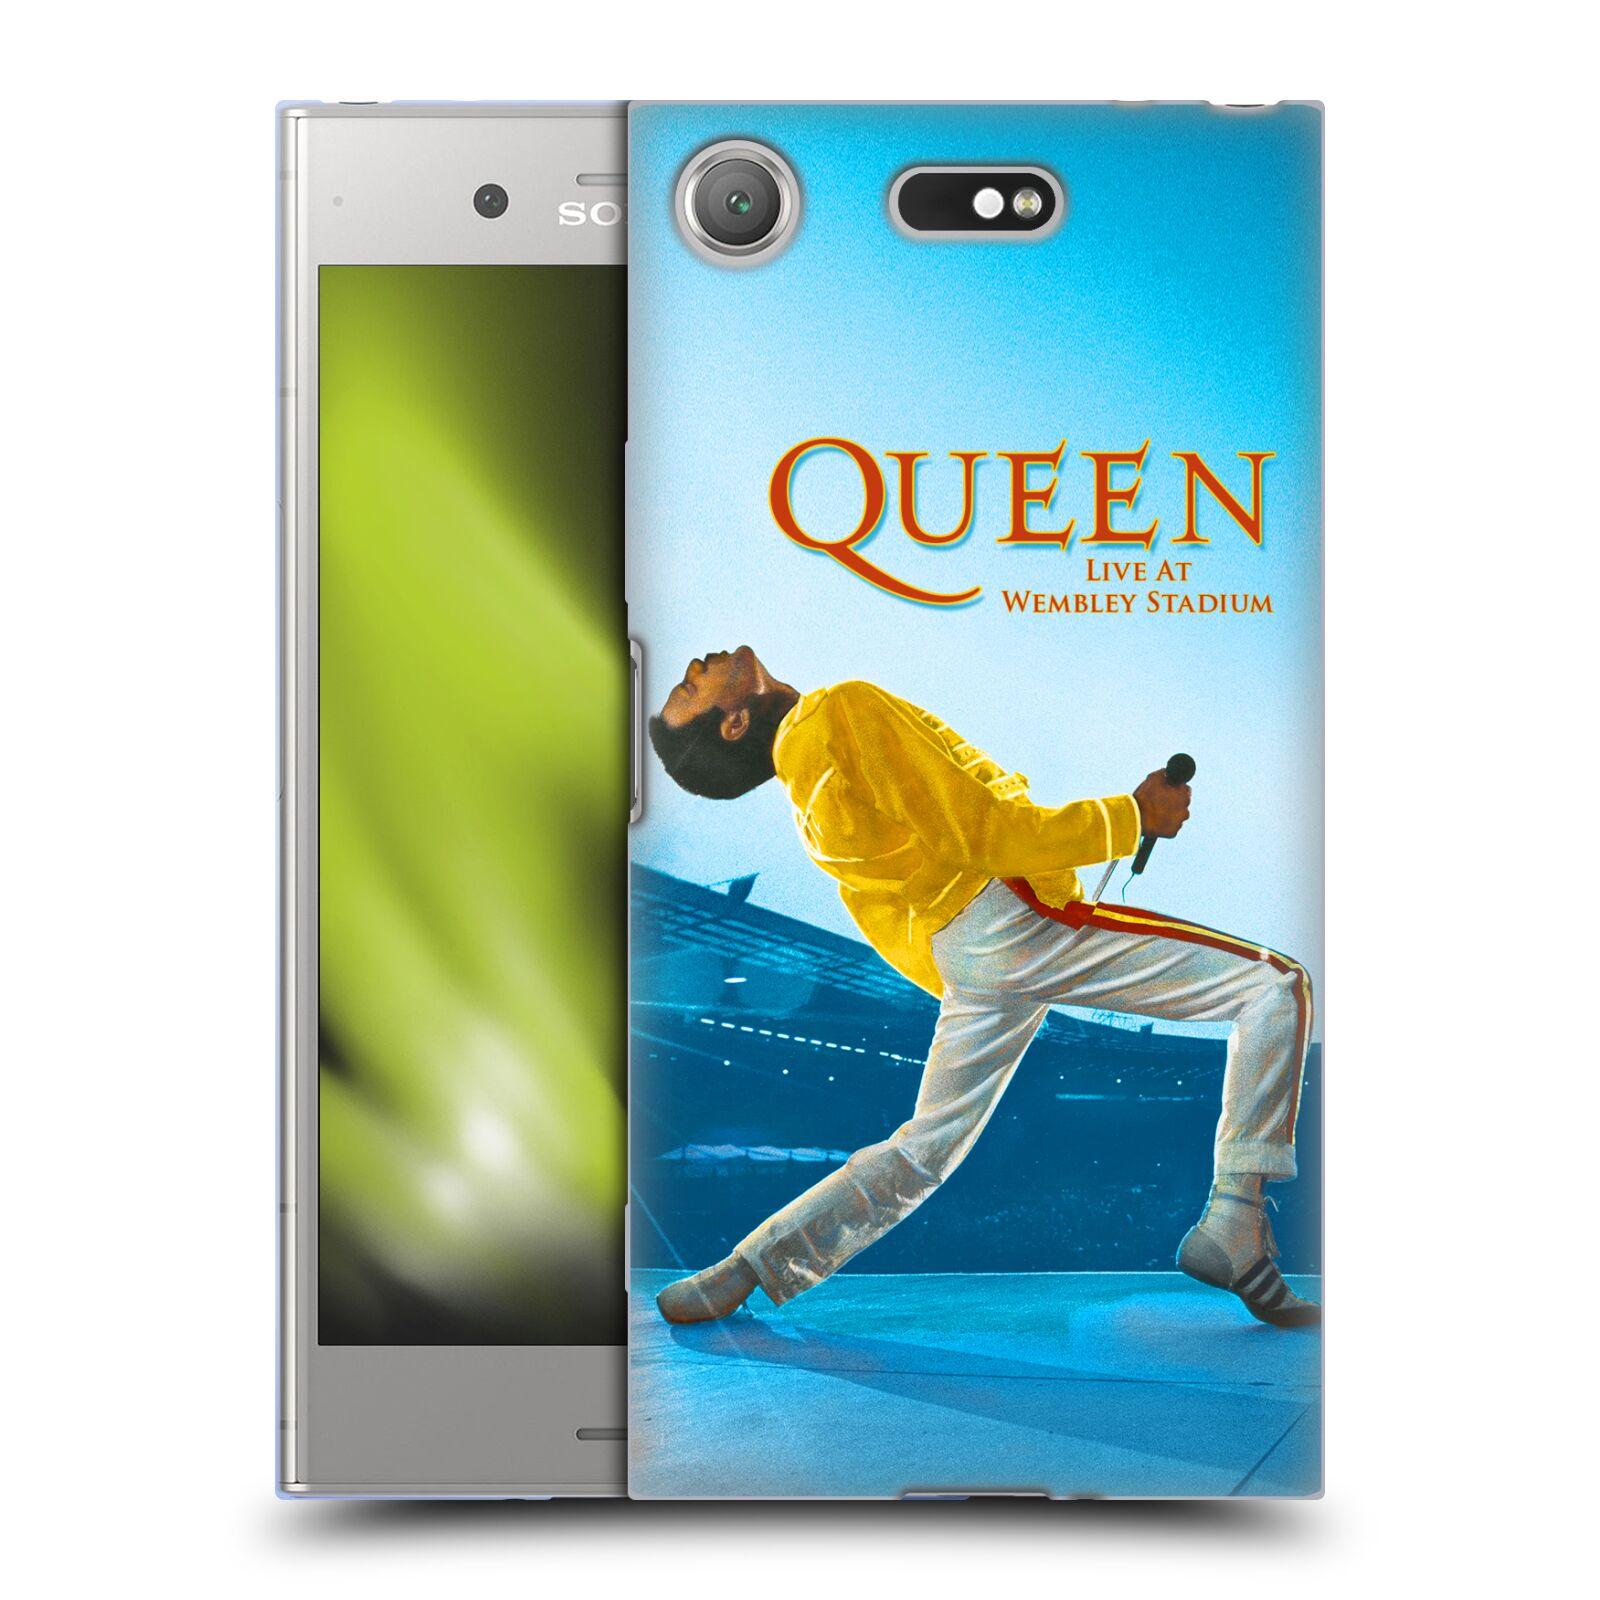 Silikonové pouzdro na mobil Sony Xperia XZ1 Compact - Head Case - Queen - Freddie Mercury